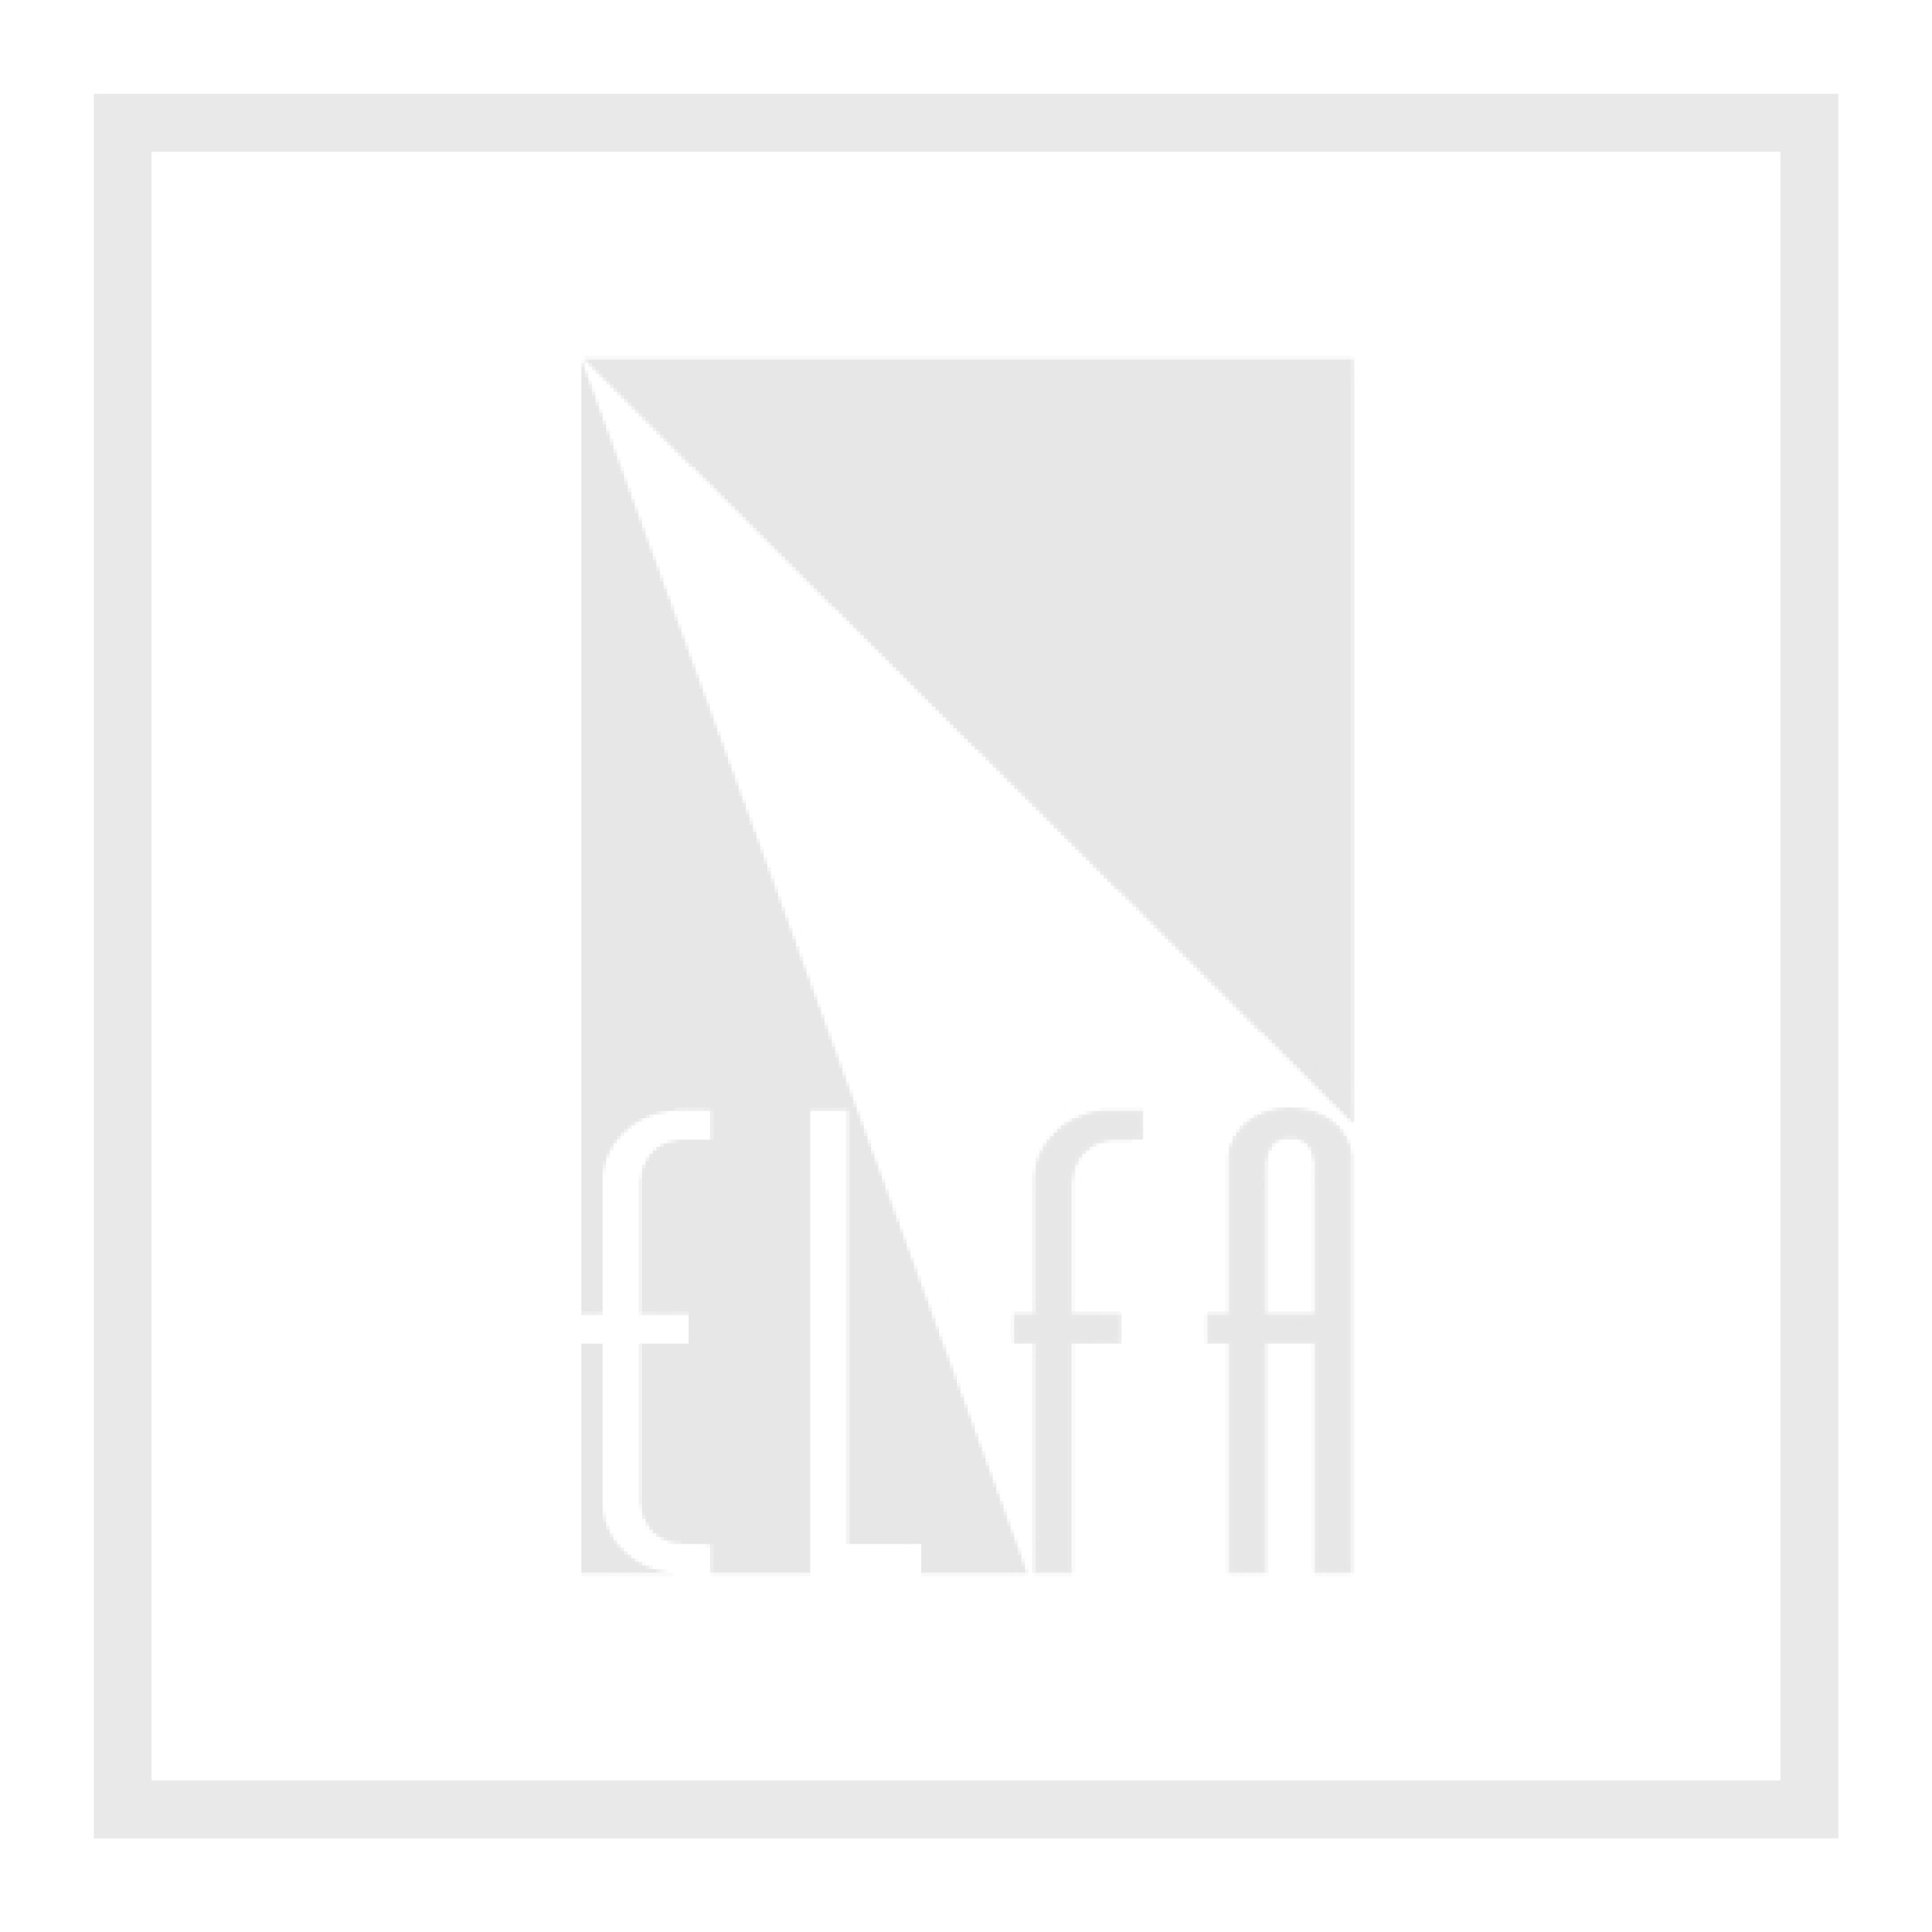 Renata Lithium knoopcel CR2032.IB MFR bulk